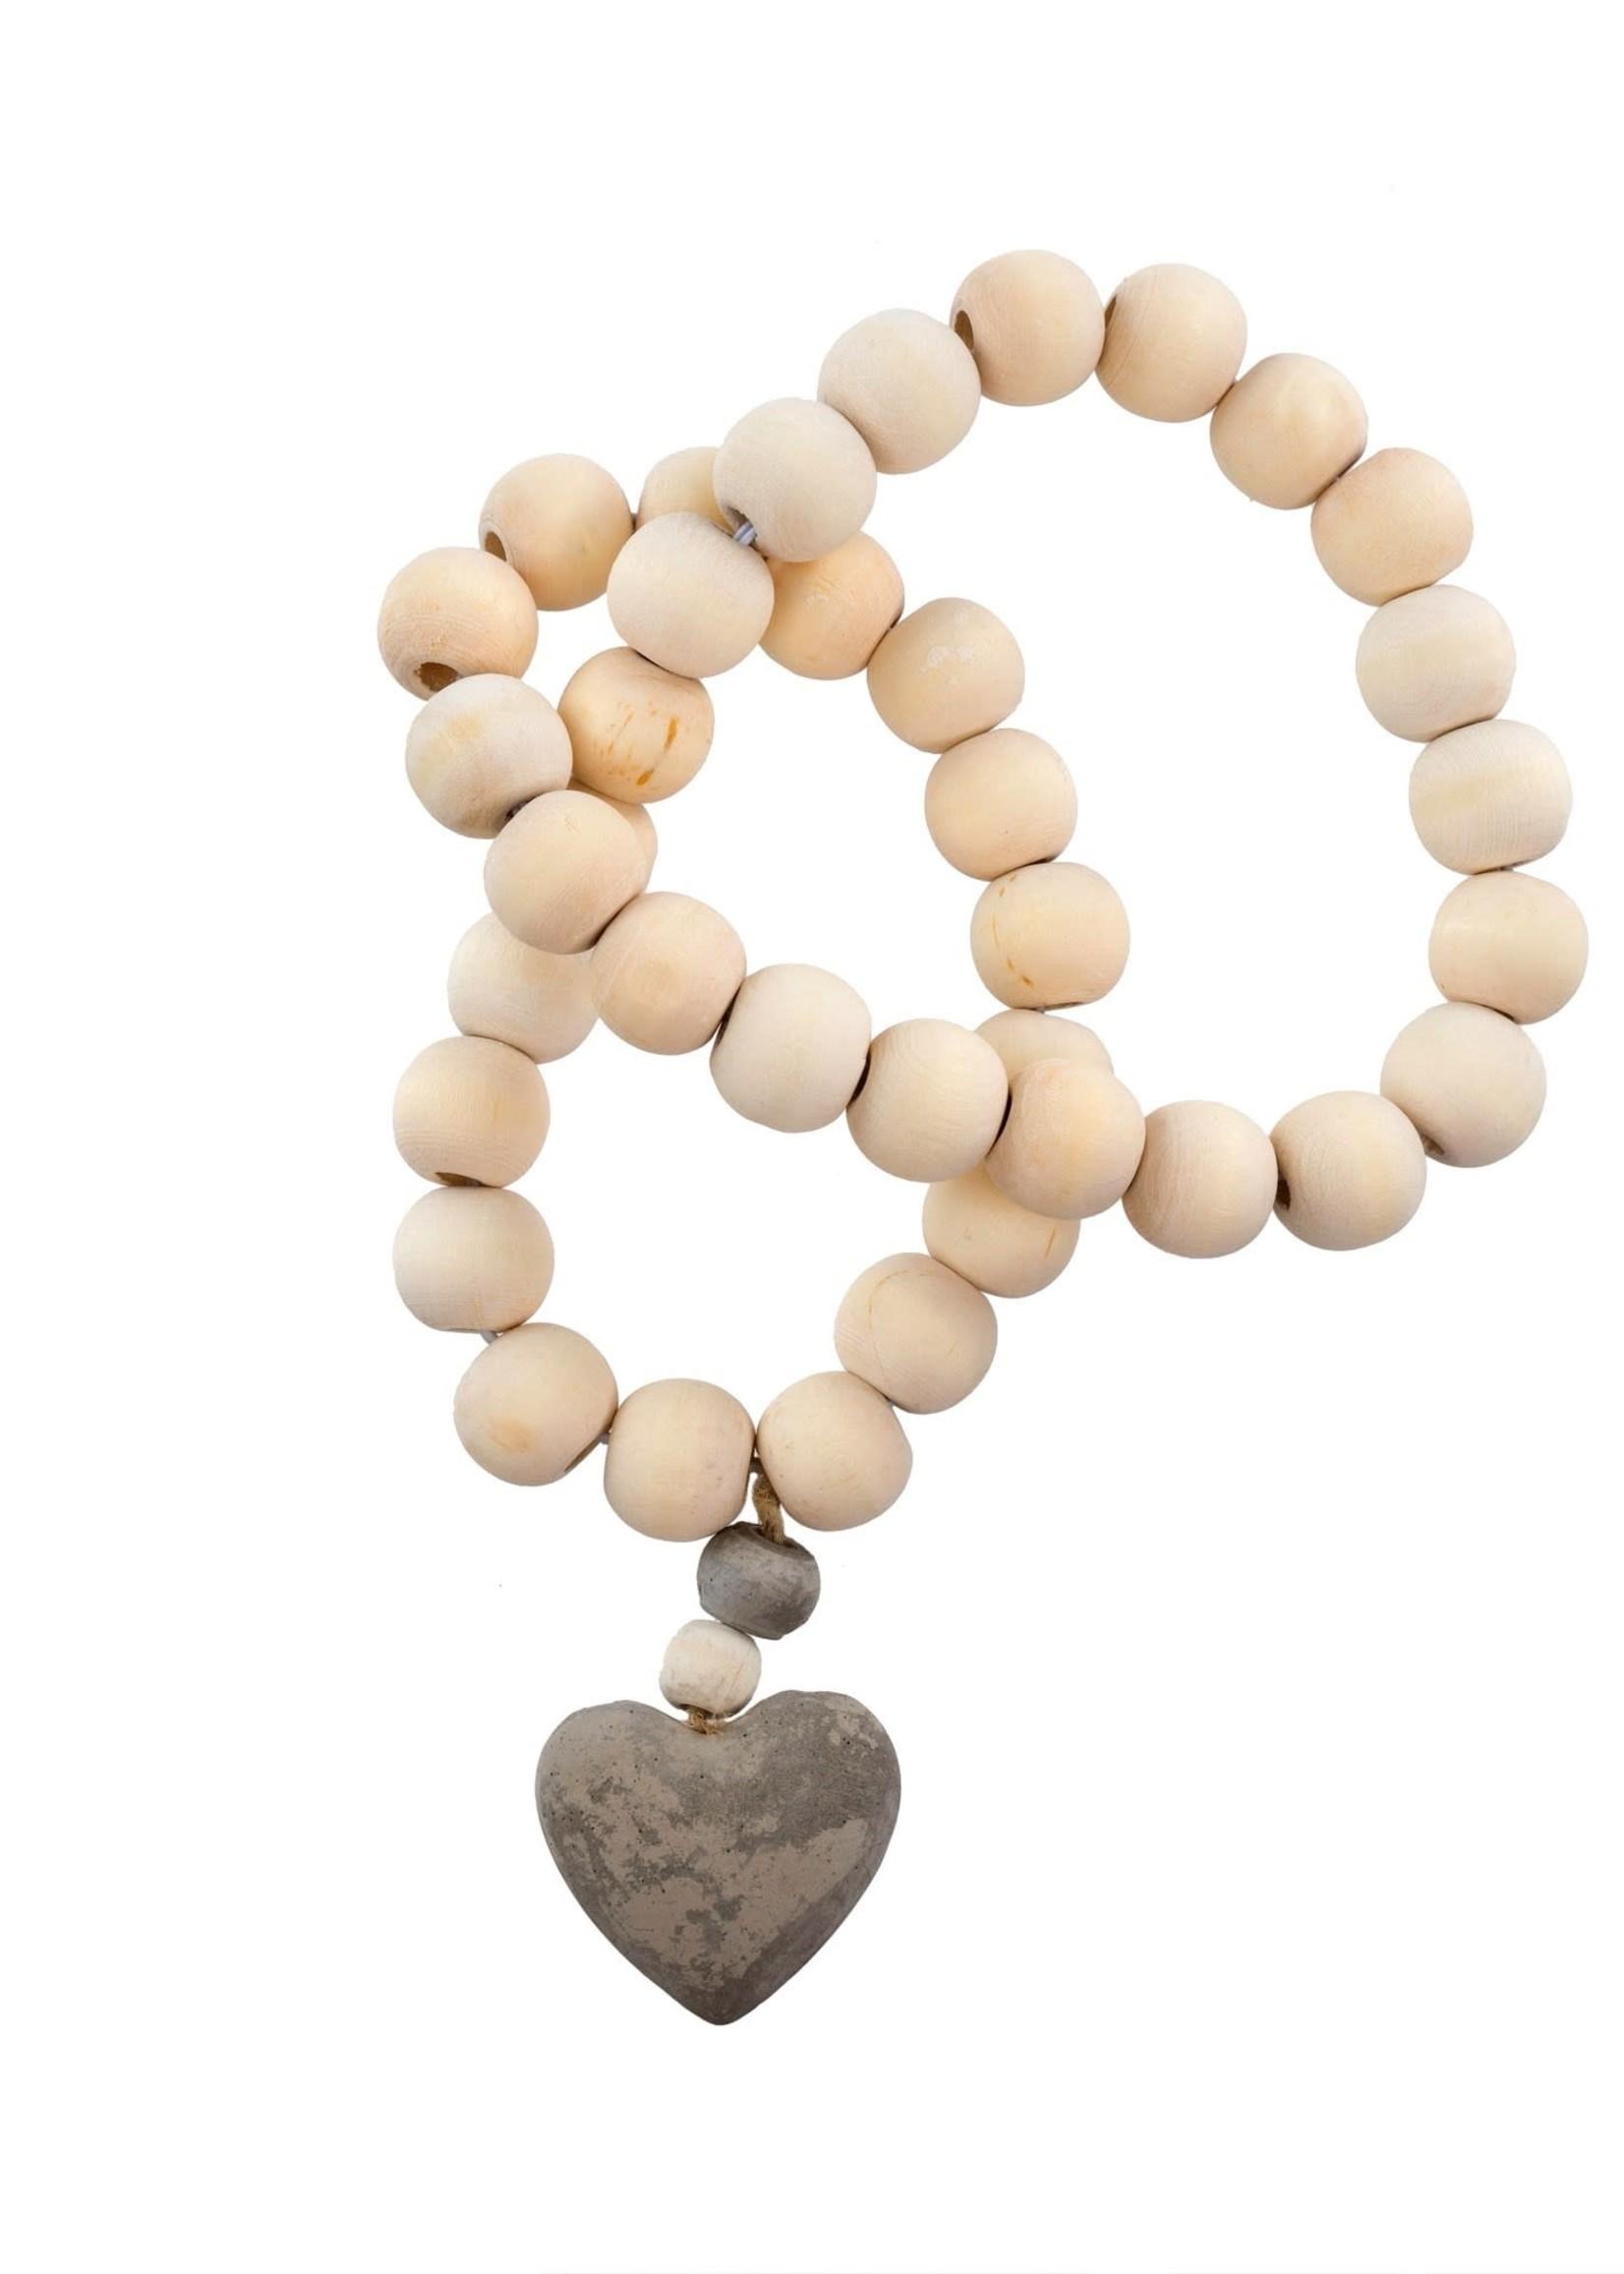 Indaba Trading Co Prayer Beads - Small